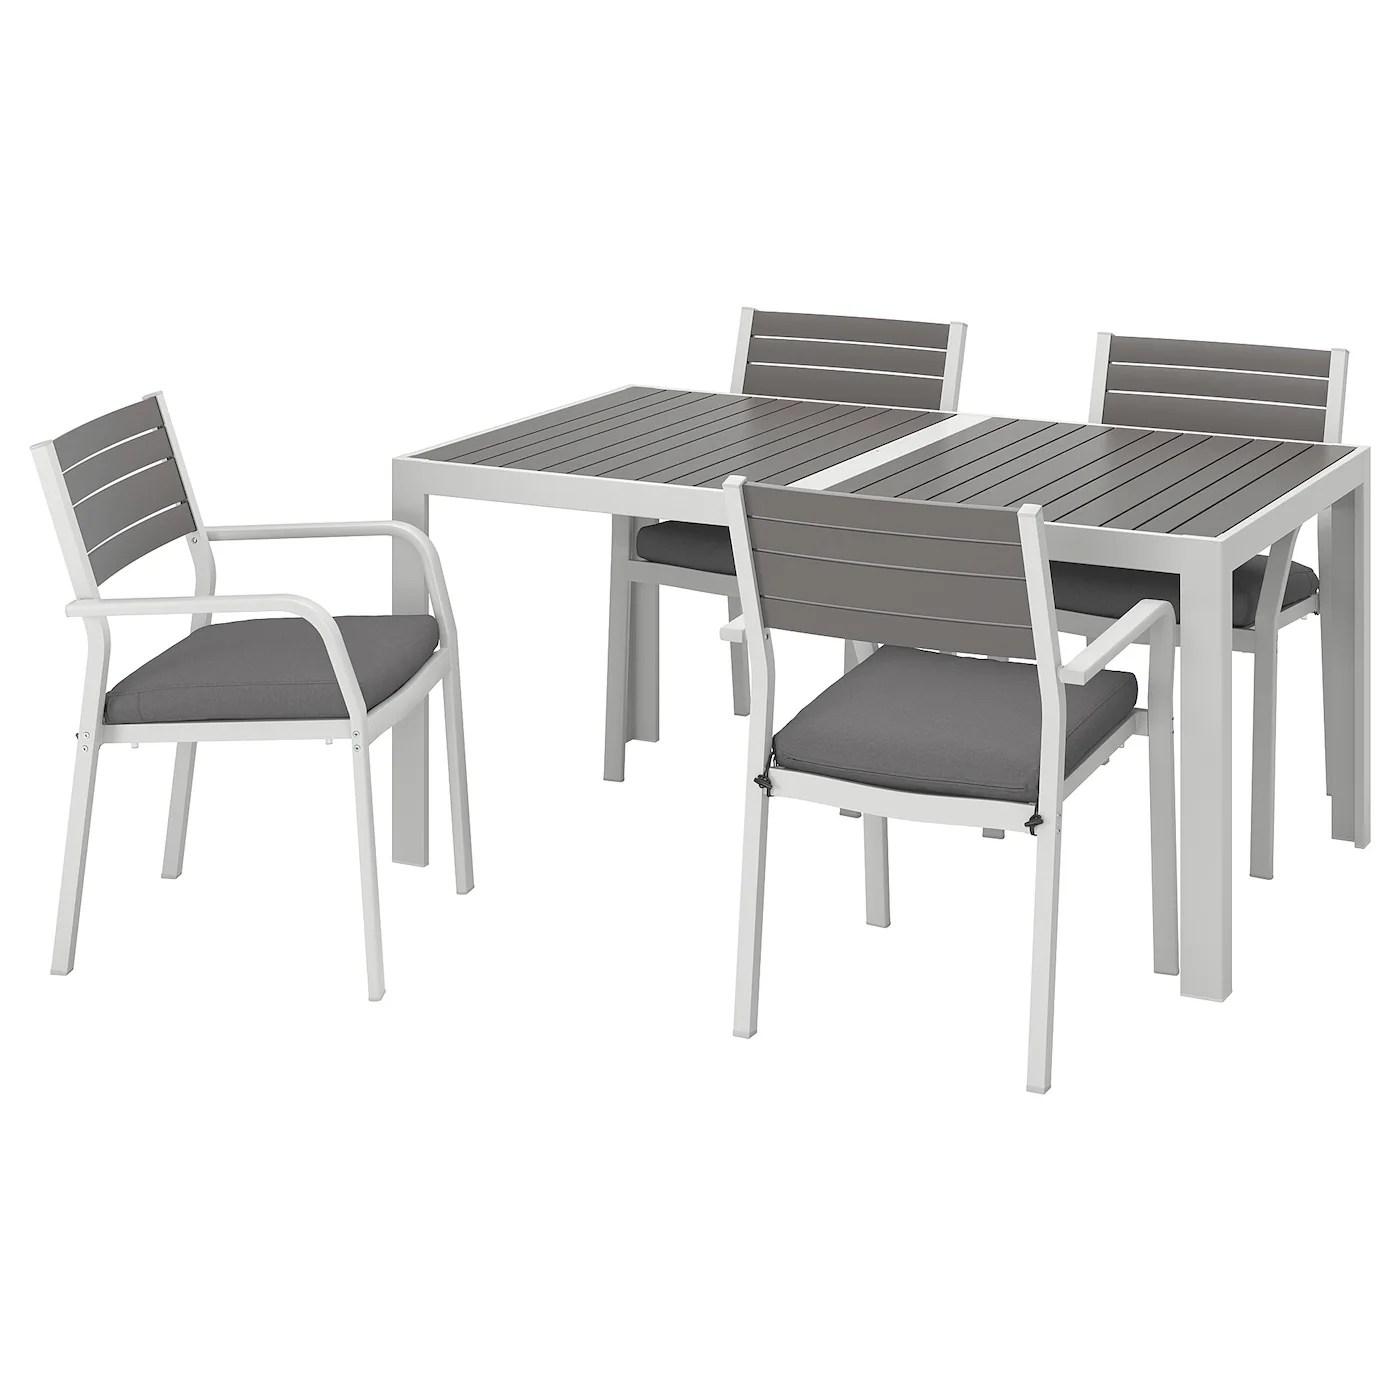 tavoli e sedie da giardino 2 sedie ikea tavolo2 sedie e ombrellone in 29019 san. Sjalland Table 4 Chairs W Armrests Outdoor Dark Grey Froson Duvholmen Dark Grey Ikea